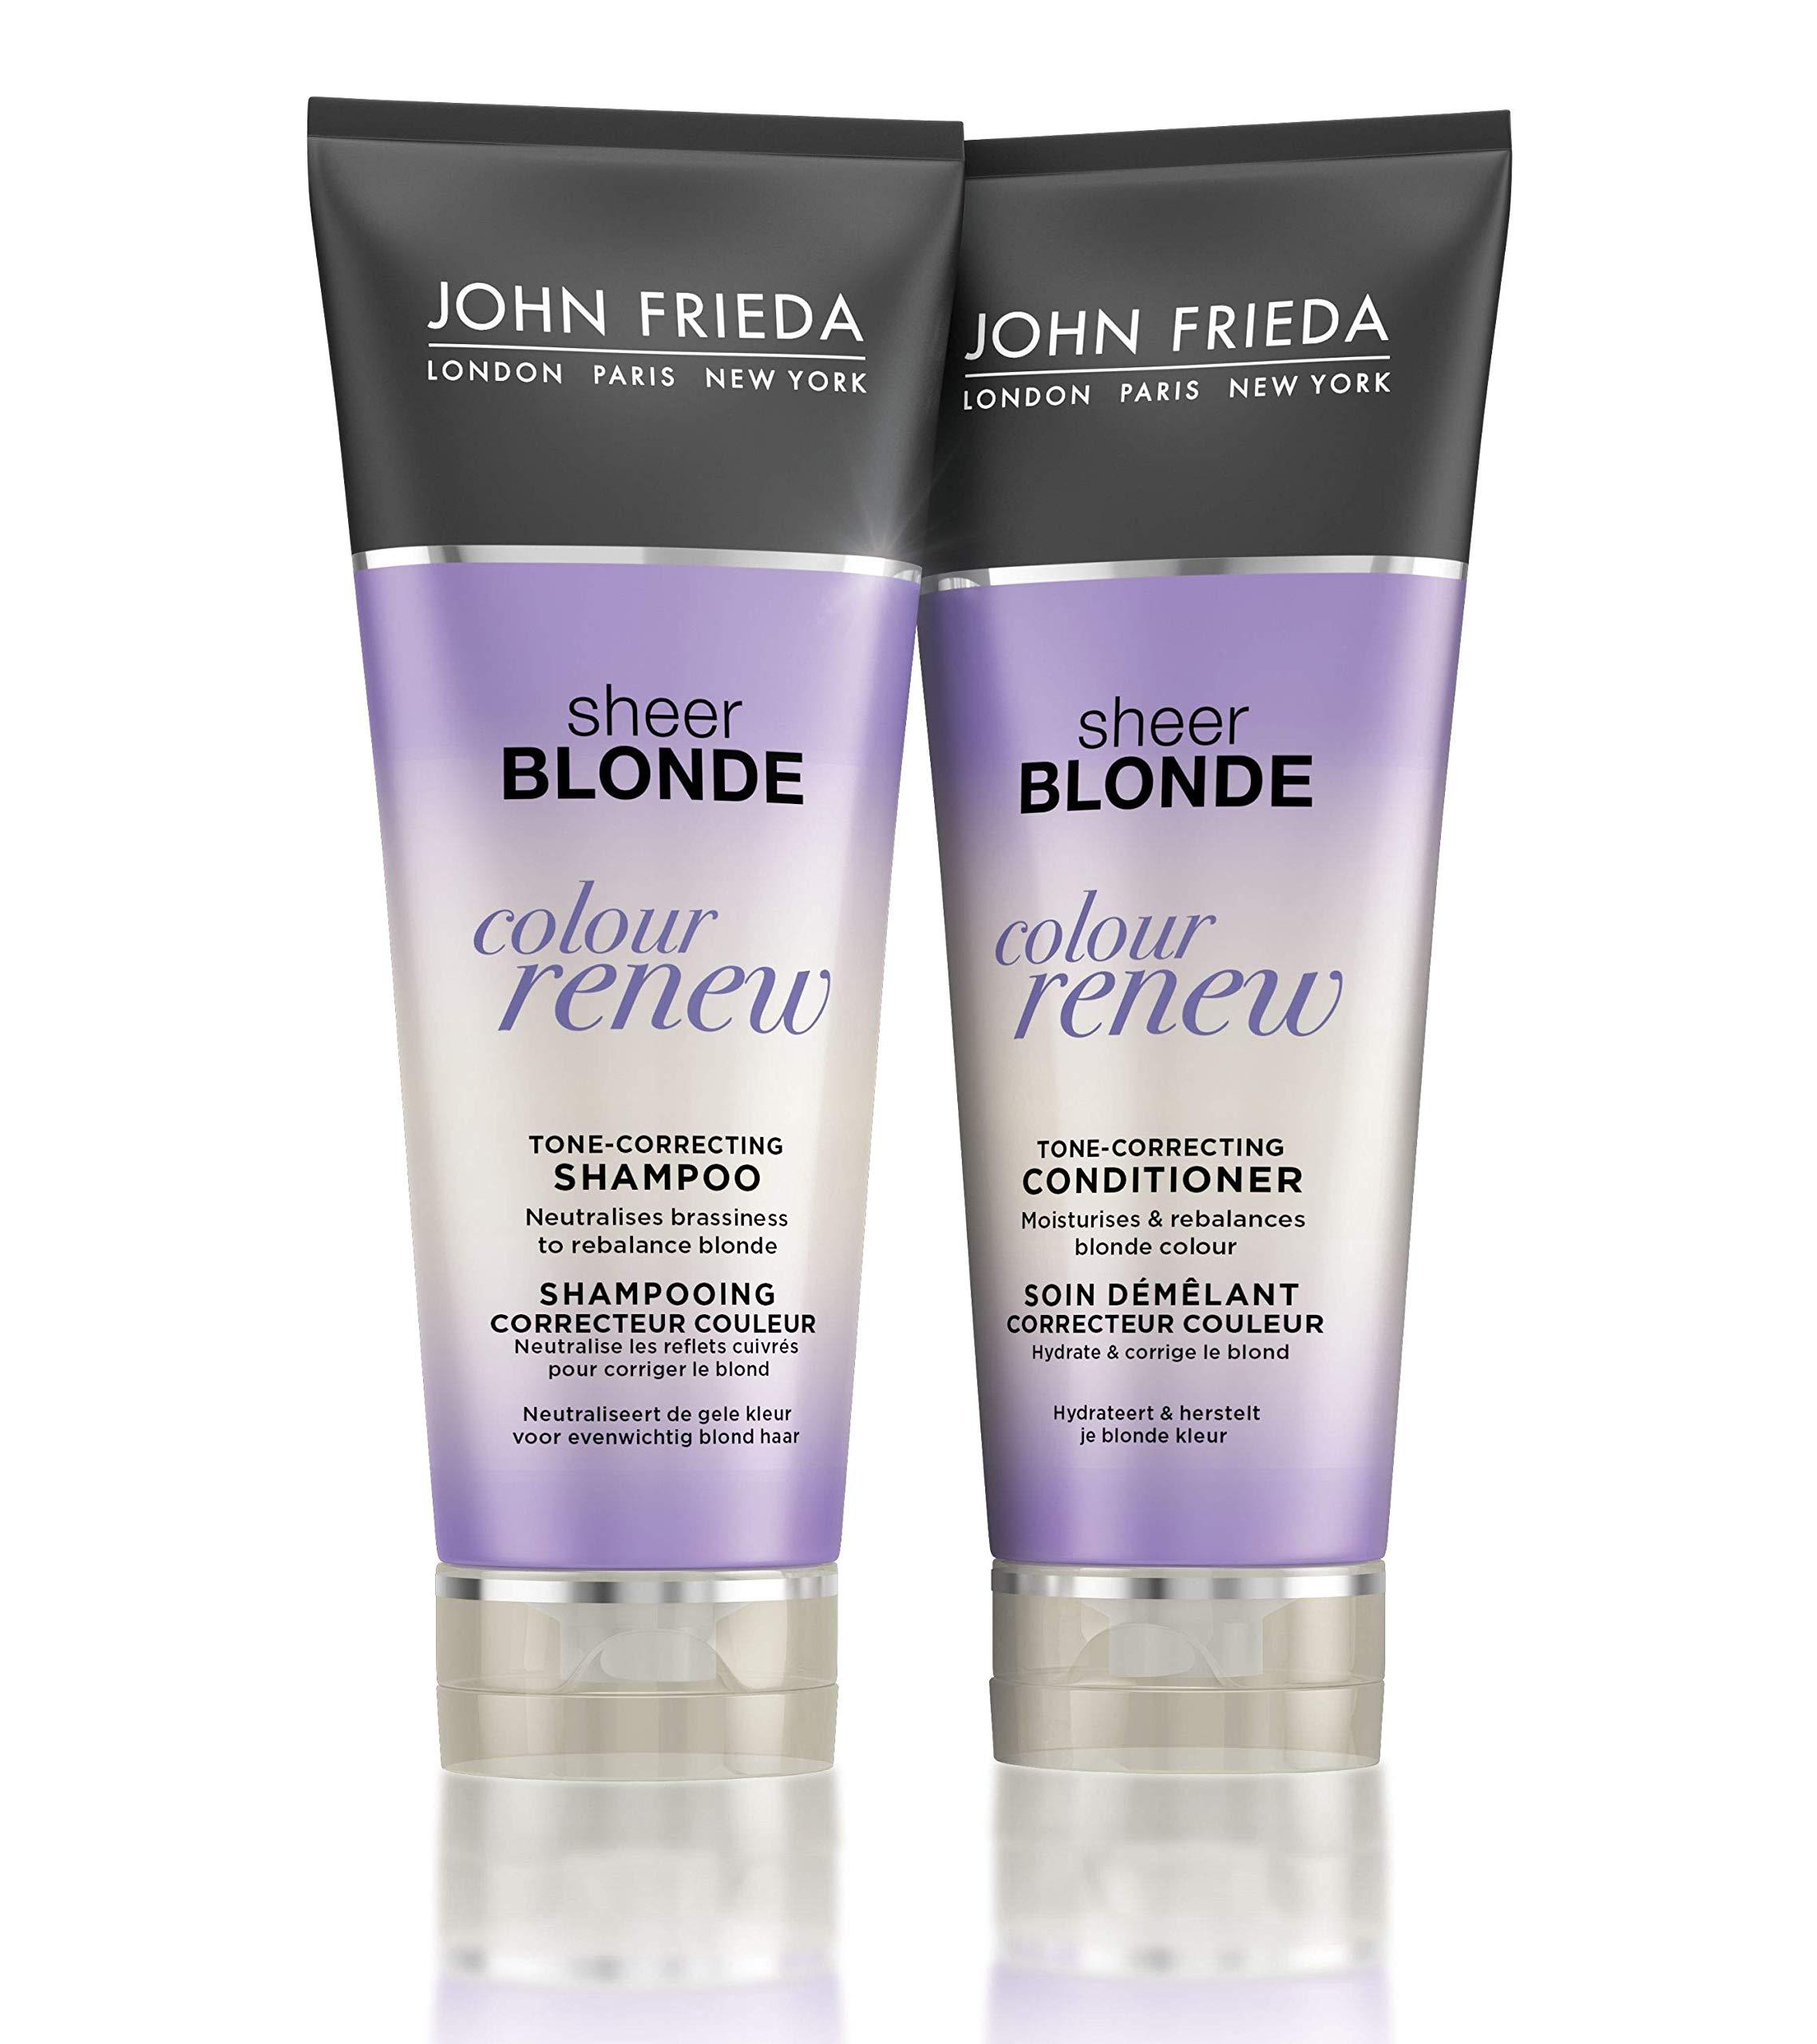 John Frieda Sheer Blonde Colour Renew Tone Correcting Duo Set Shampoo Conditioner 8 45 Ounce 1 Each Buy Online In El Salvador At Elsalvador Desertcart Com Productid 19569097